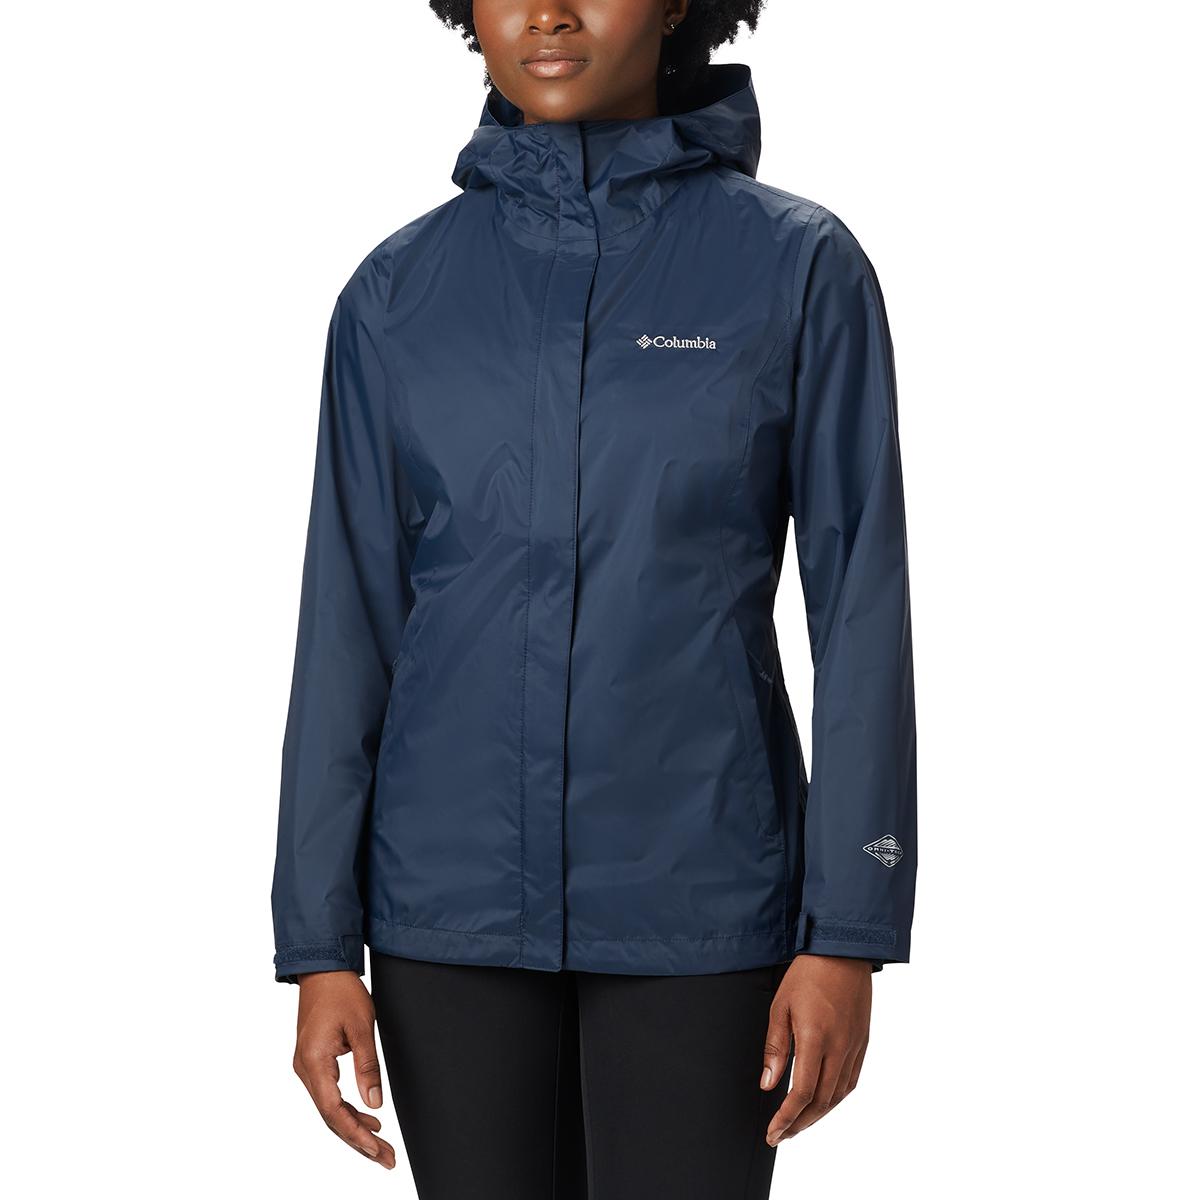 Columbia Women's Arcadia Rain Jacket - Blue, XS